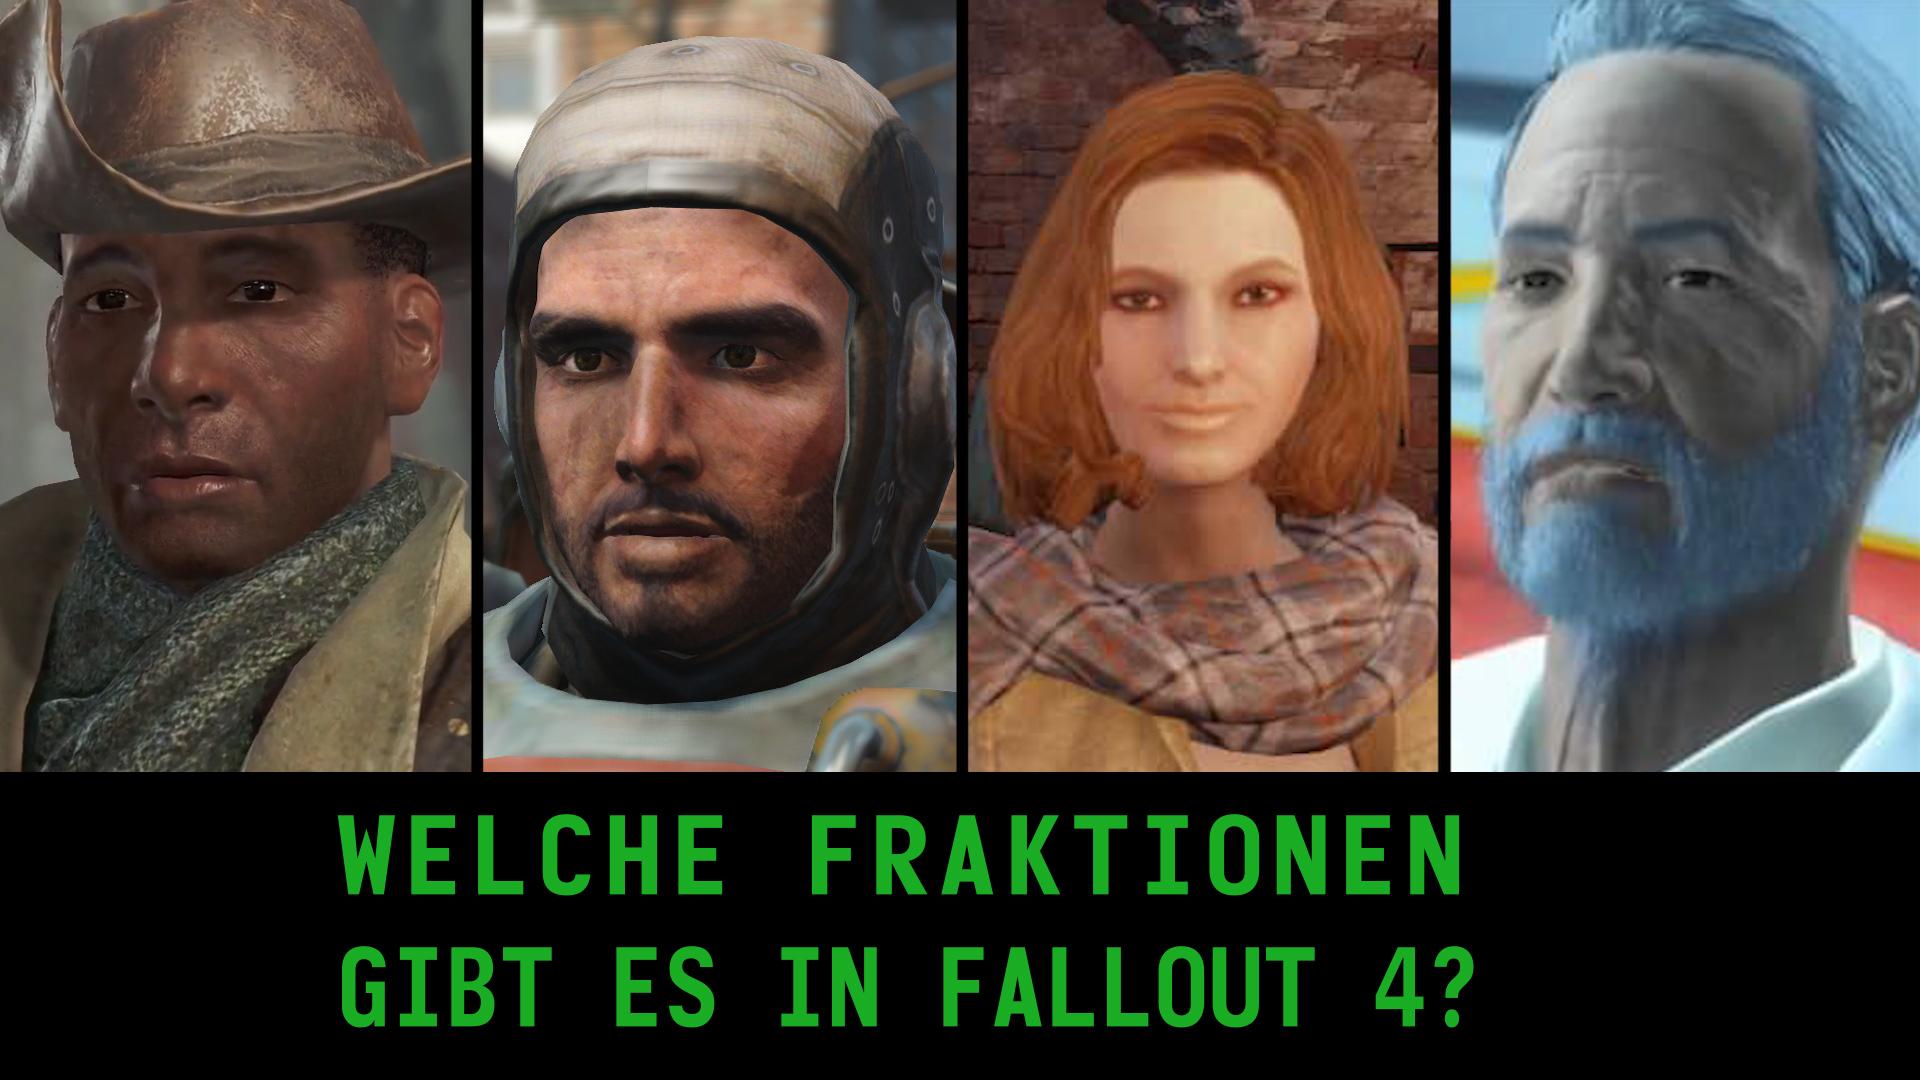 Fallout 4 rapid bani opțiunea binex